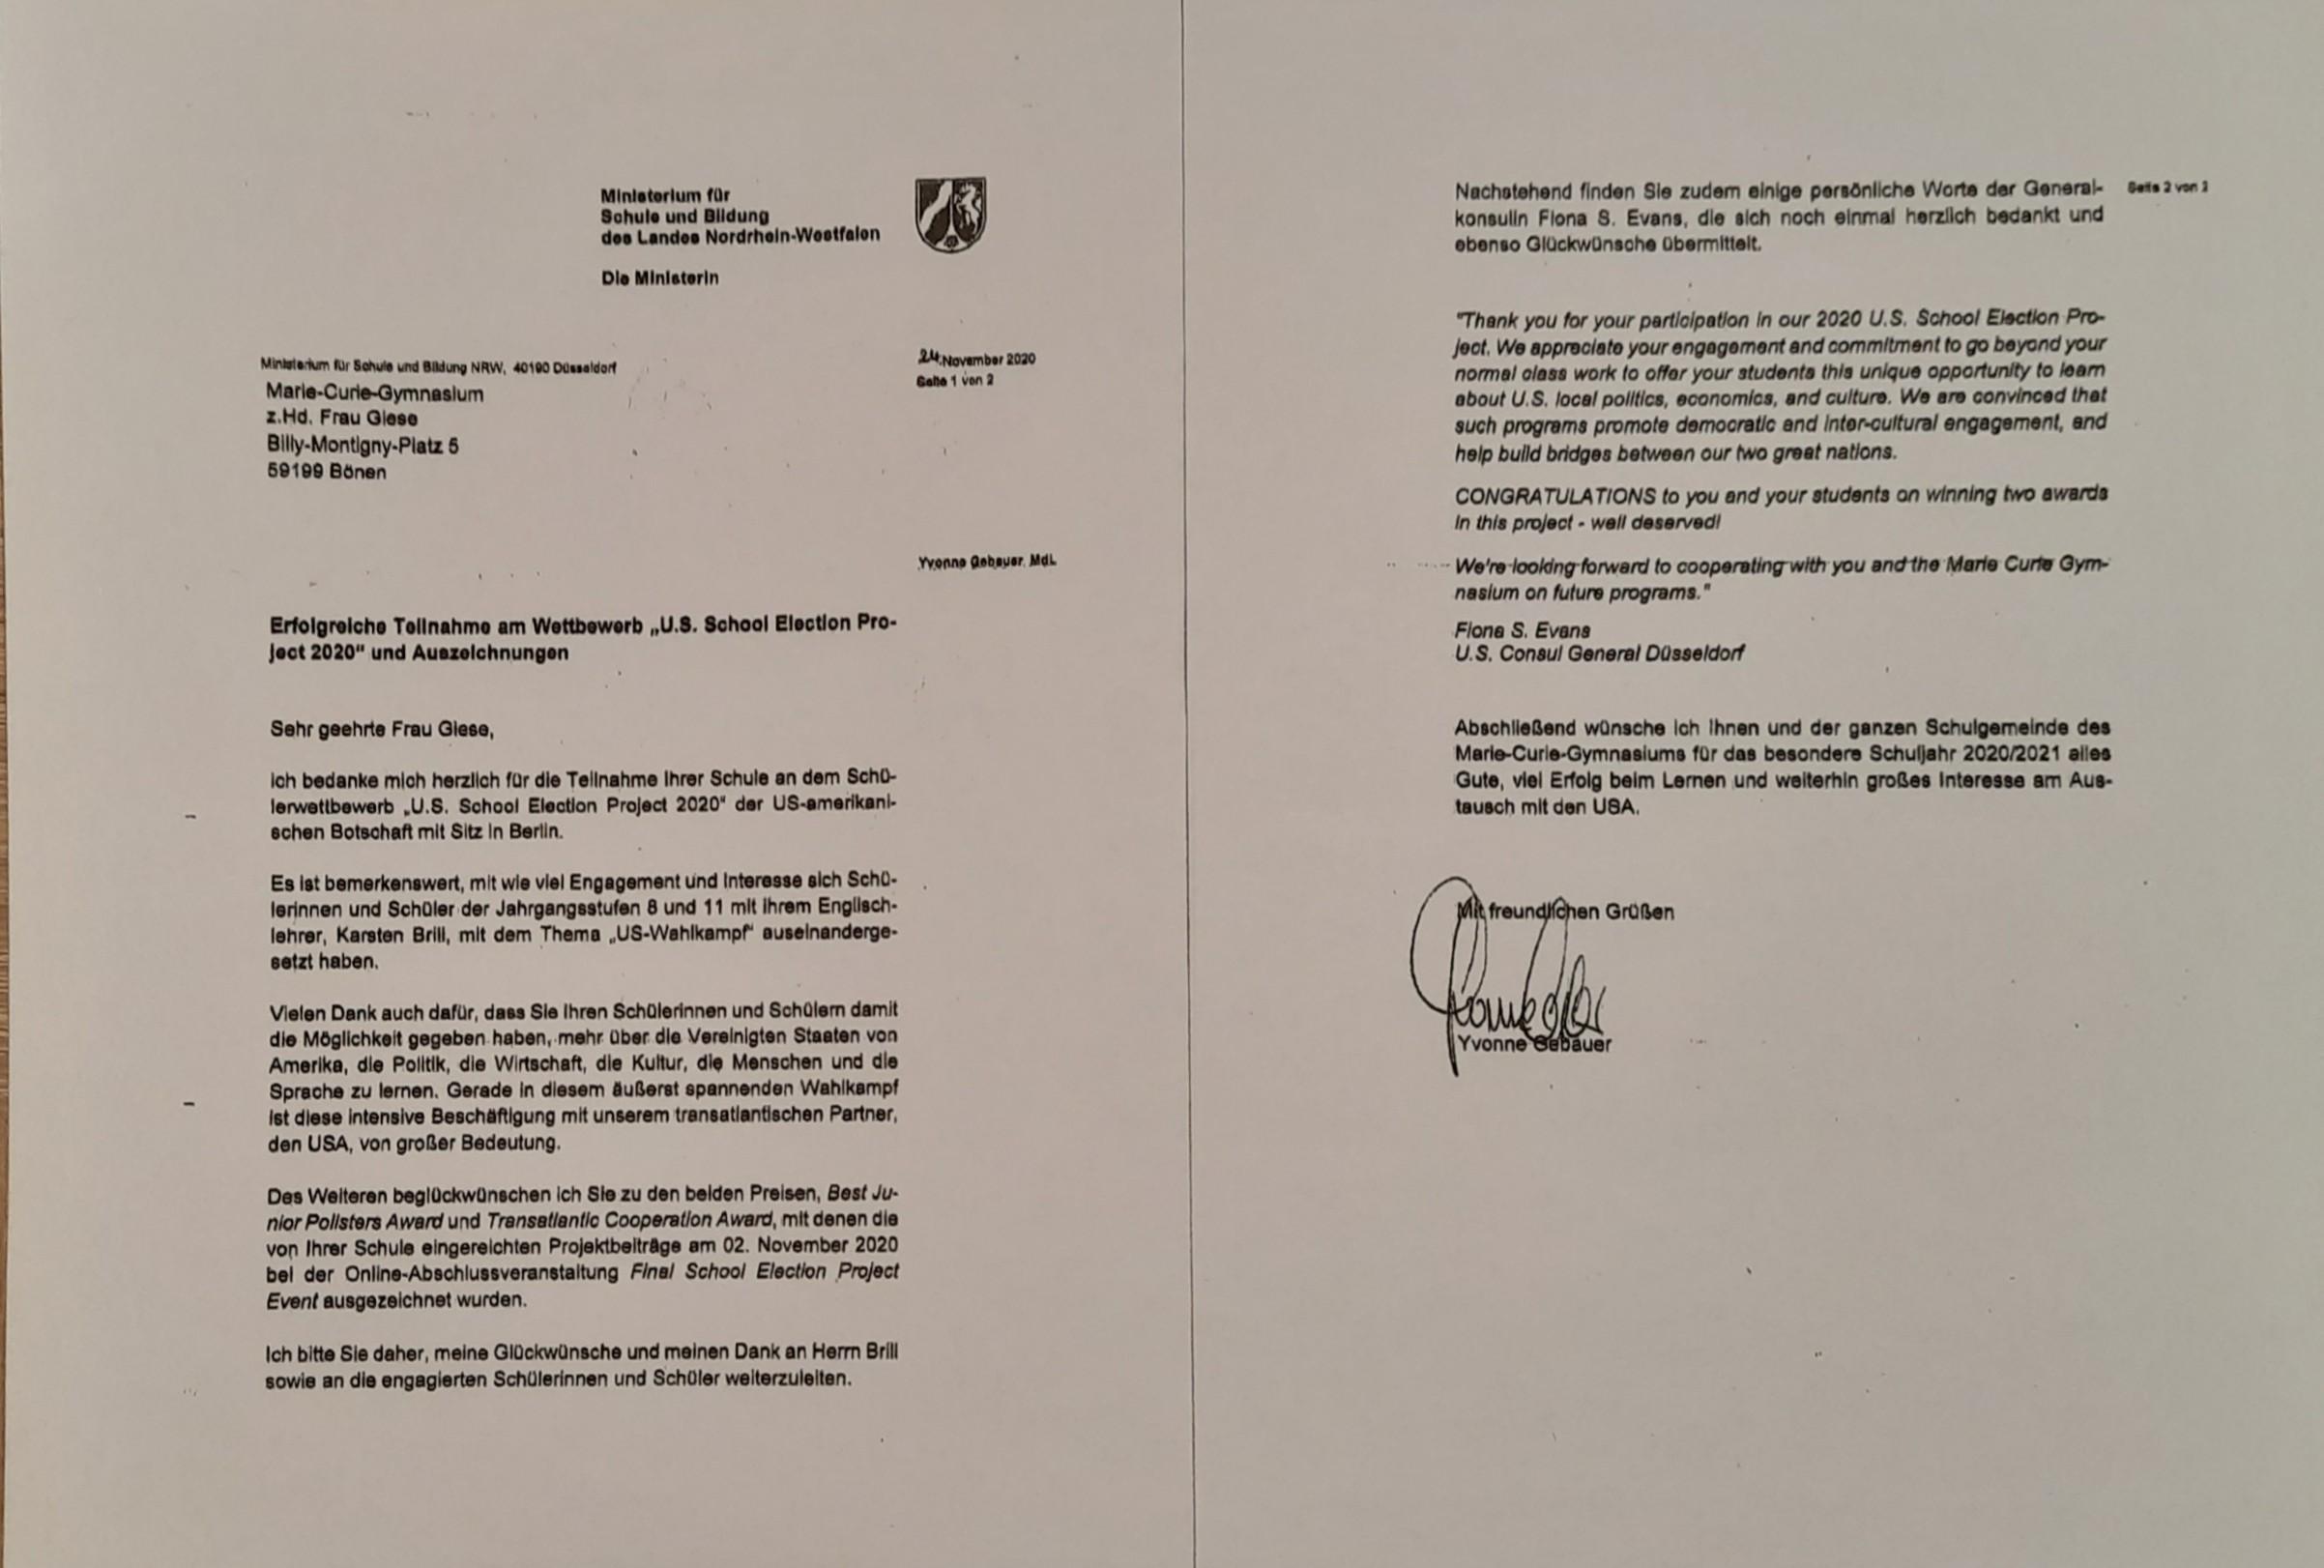 Glückwünsche per Post: Das Schulministerium NRW gratuliert zum U.S. School Election Project 2020